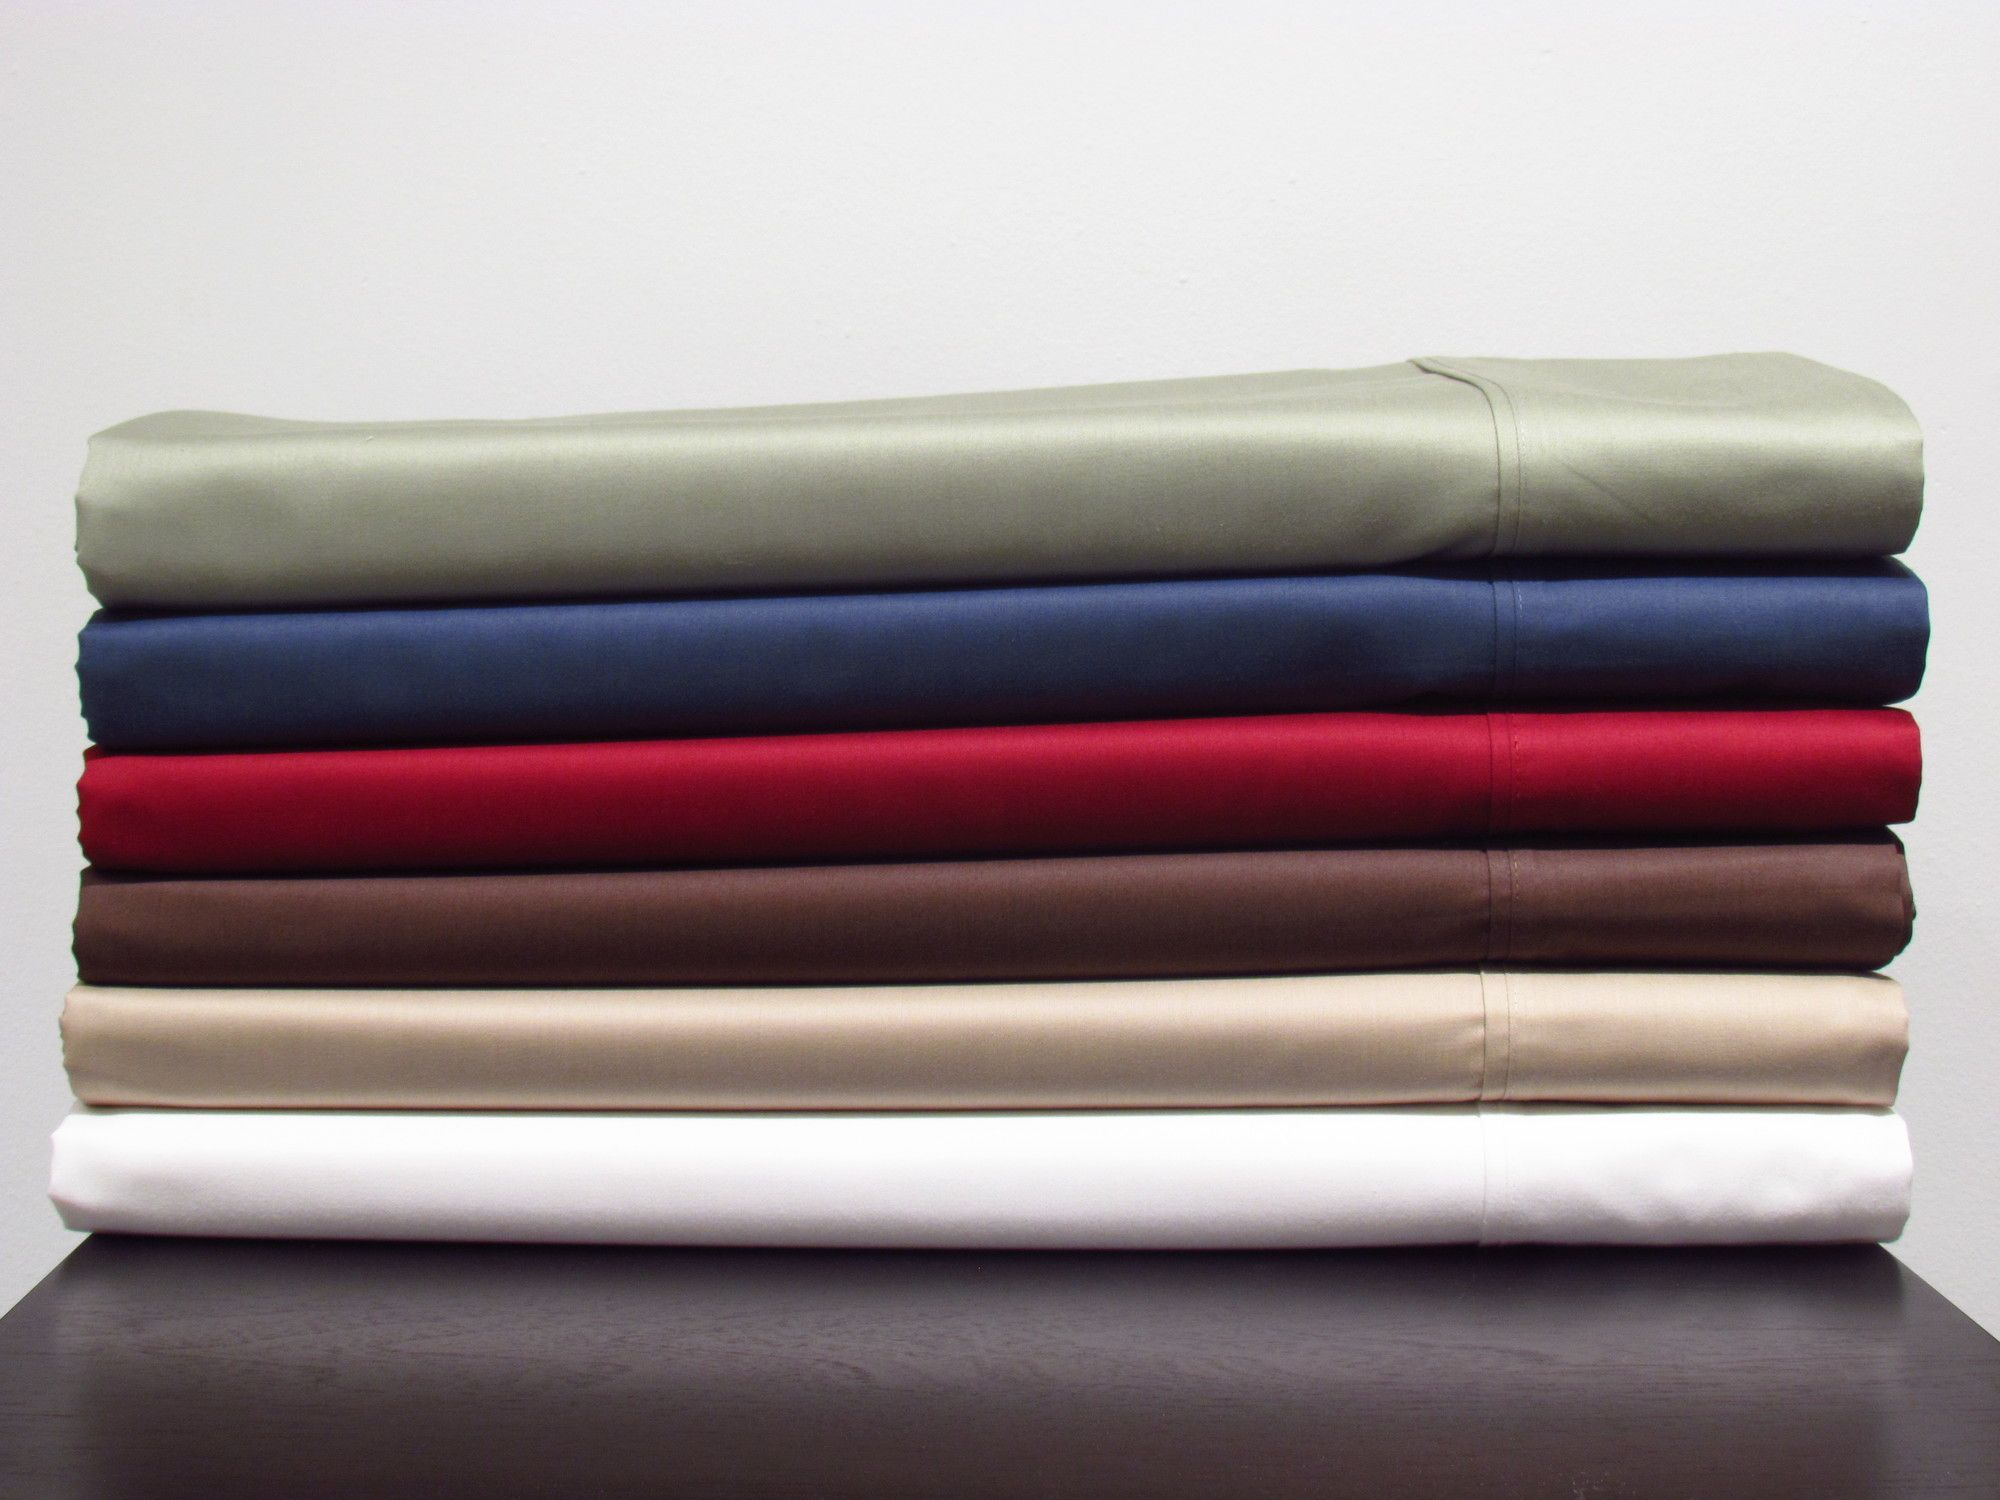 Lashbrook 620 Thread Count Egyptian Cotton Sheet Set